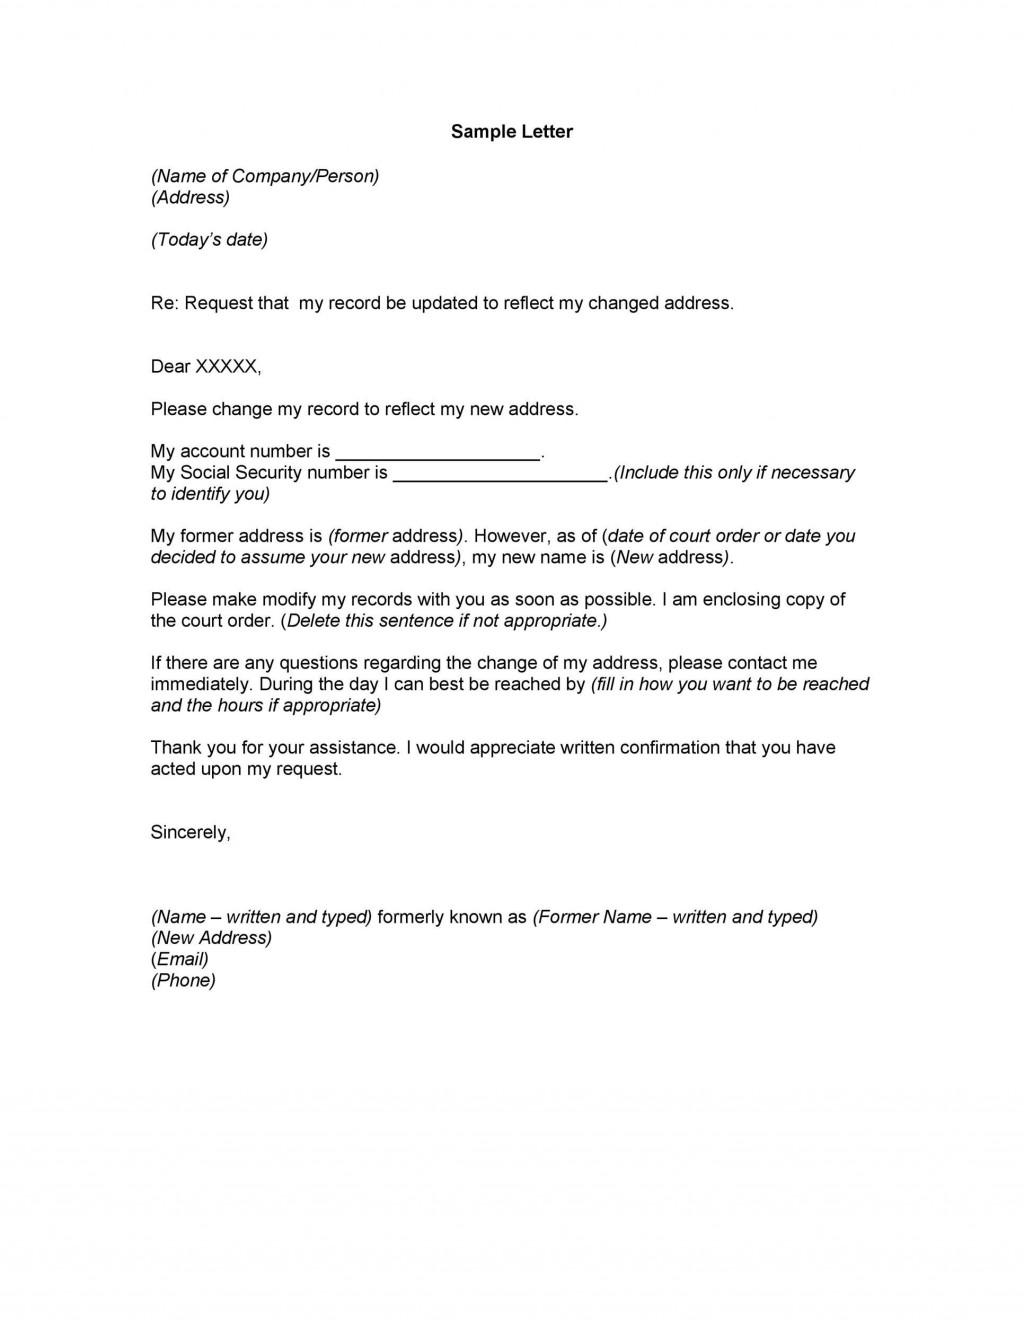 005 Stunning Change Of Addres Letter Template Sample  Templates For Busines FreeLarge